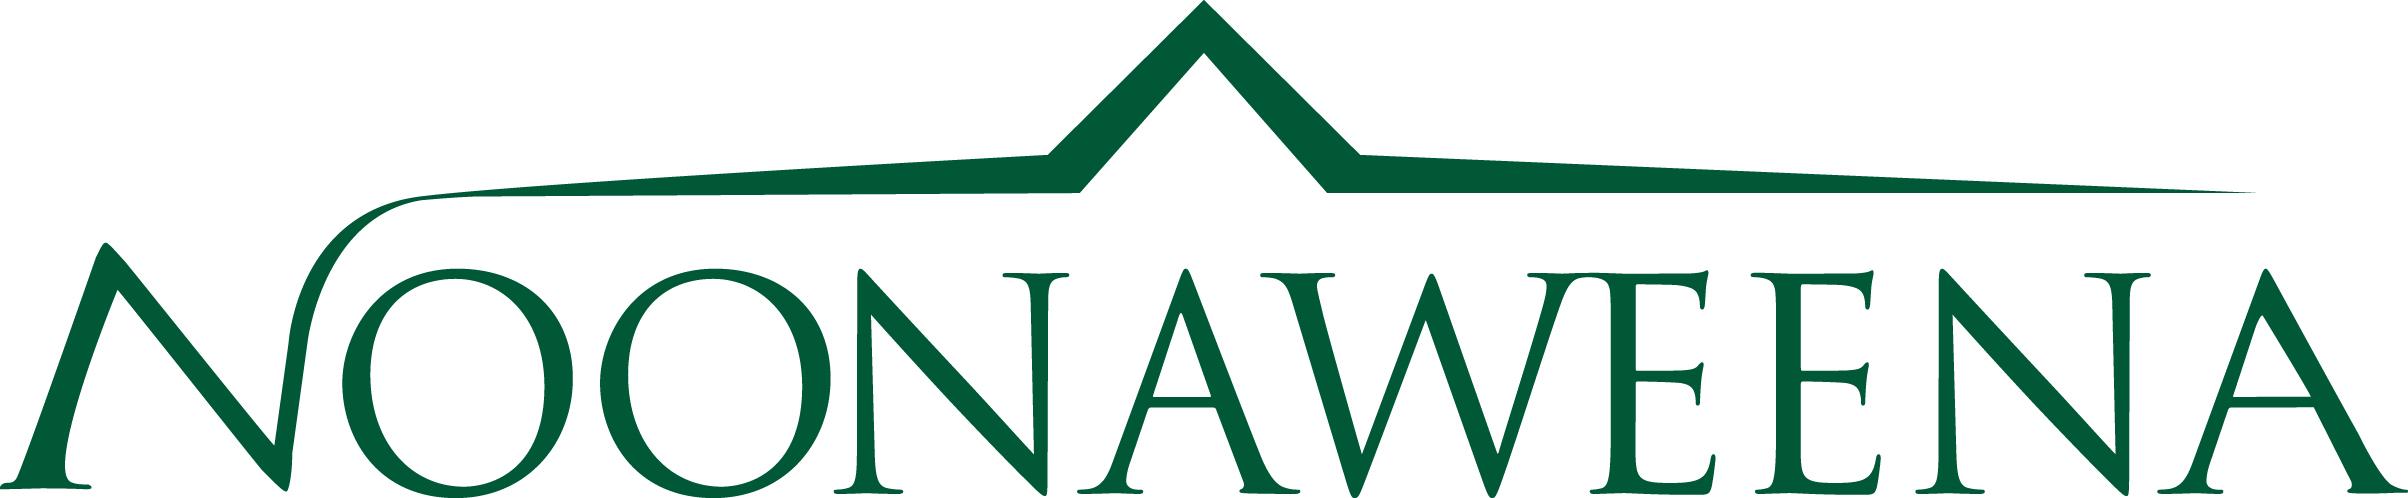 Noonaweena Logo